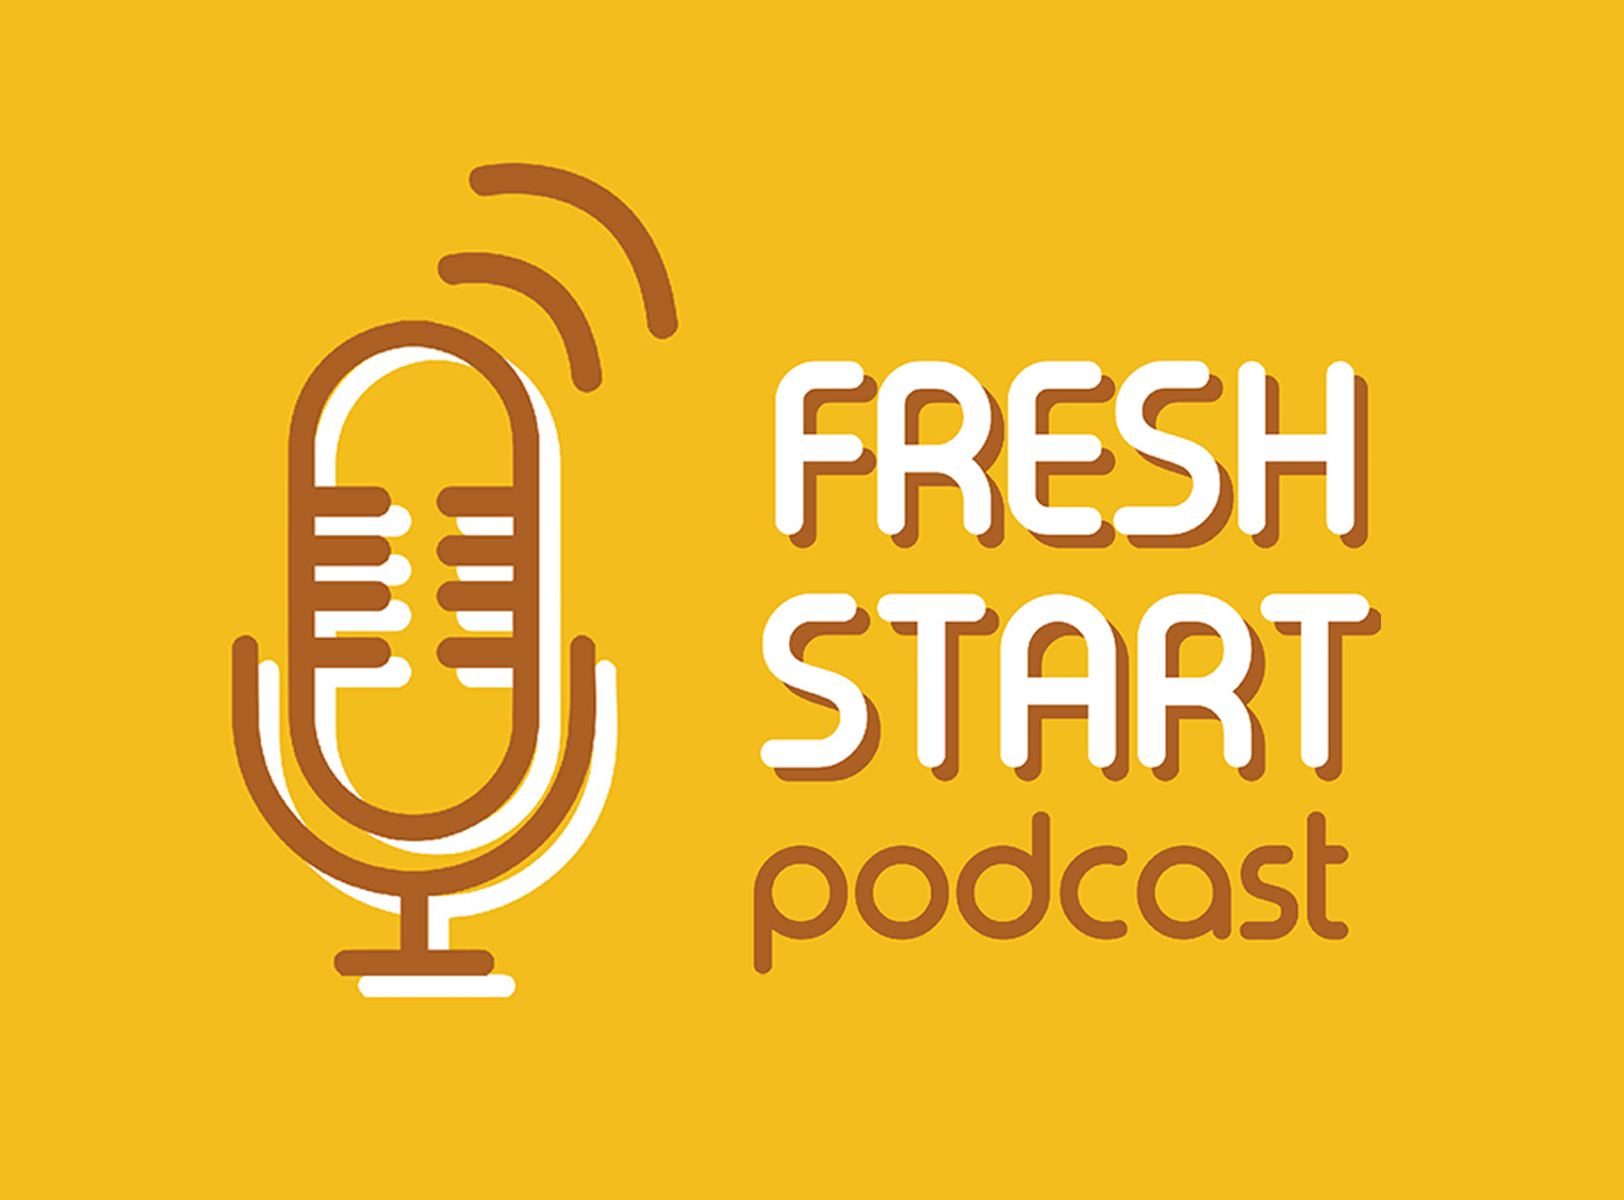 Fresh Start: Podcast News (4/27/2020 Mon.)